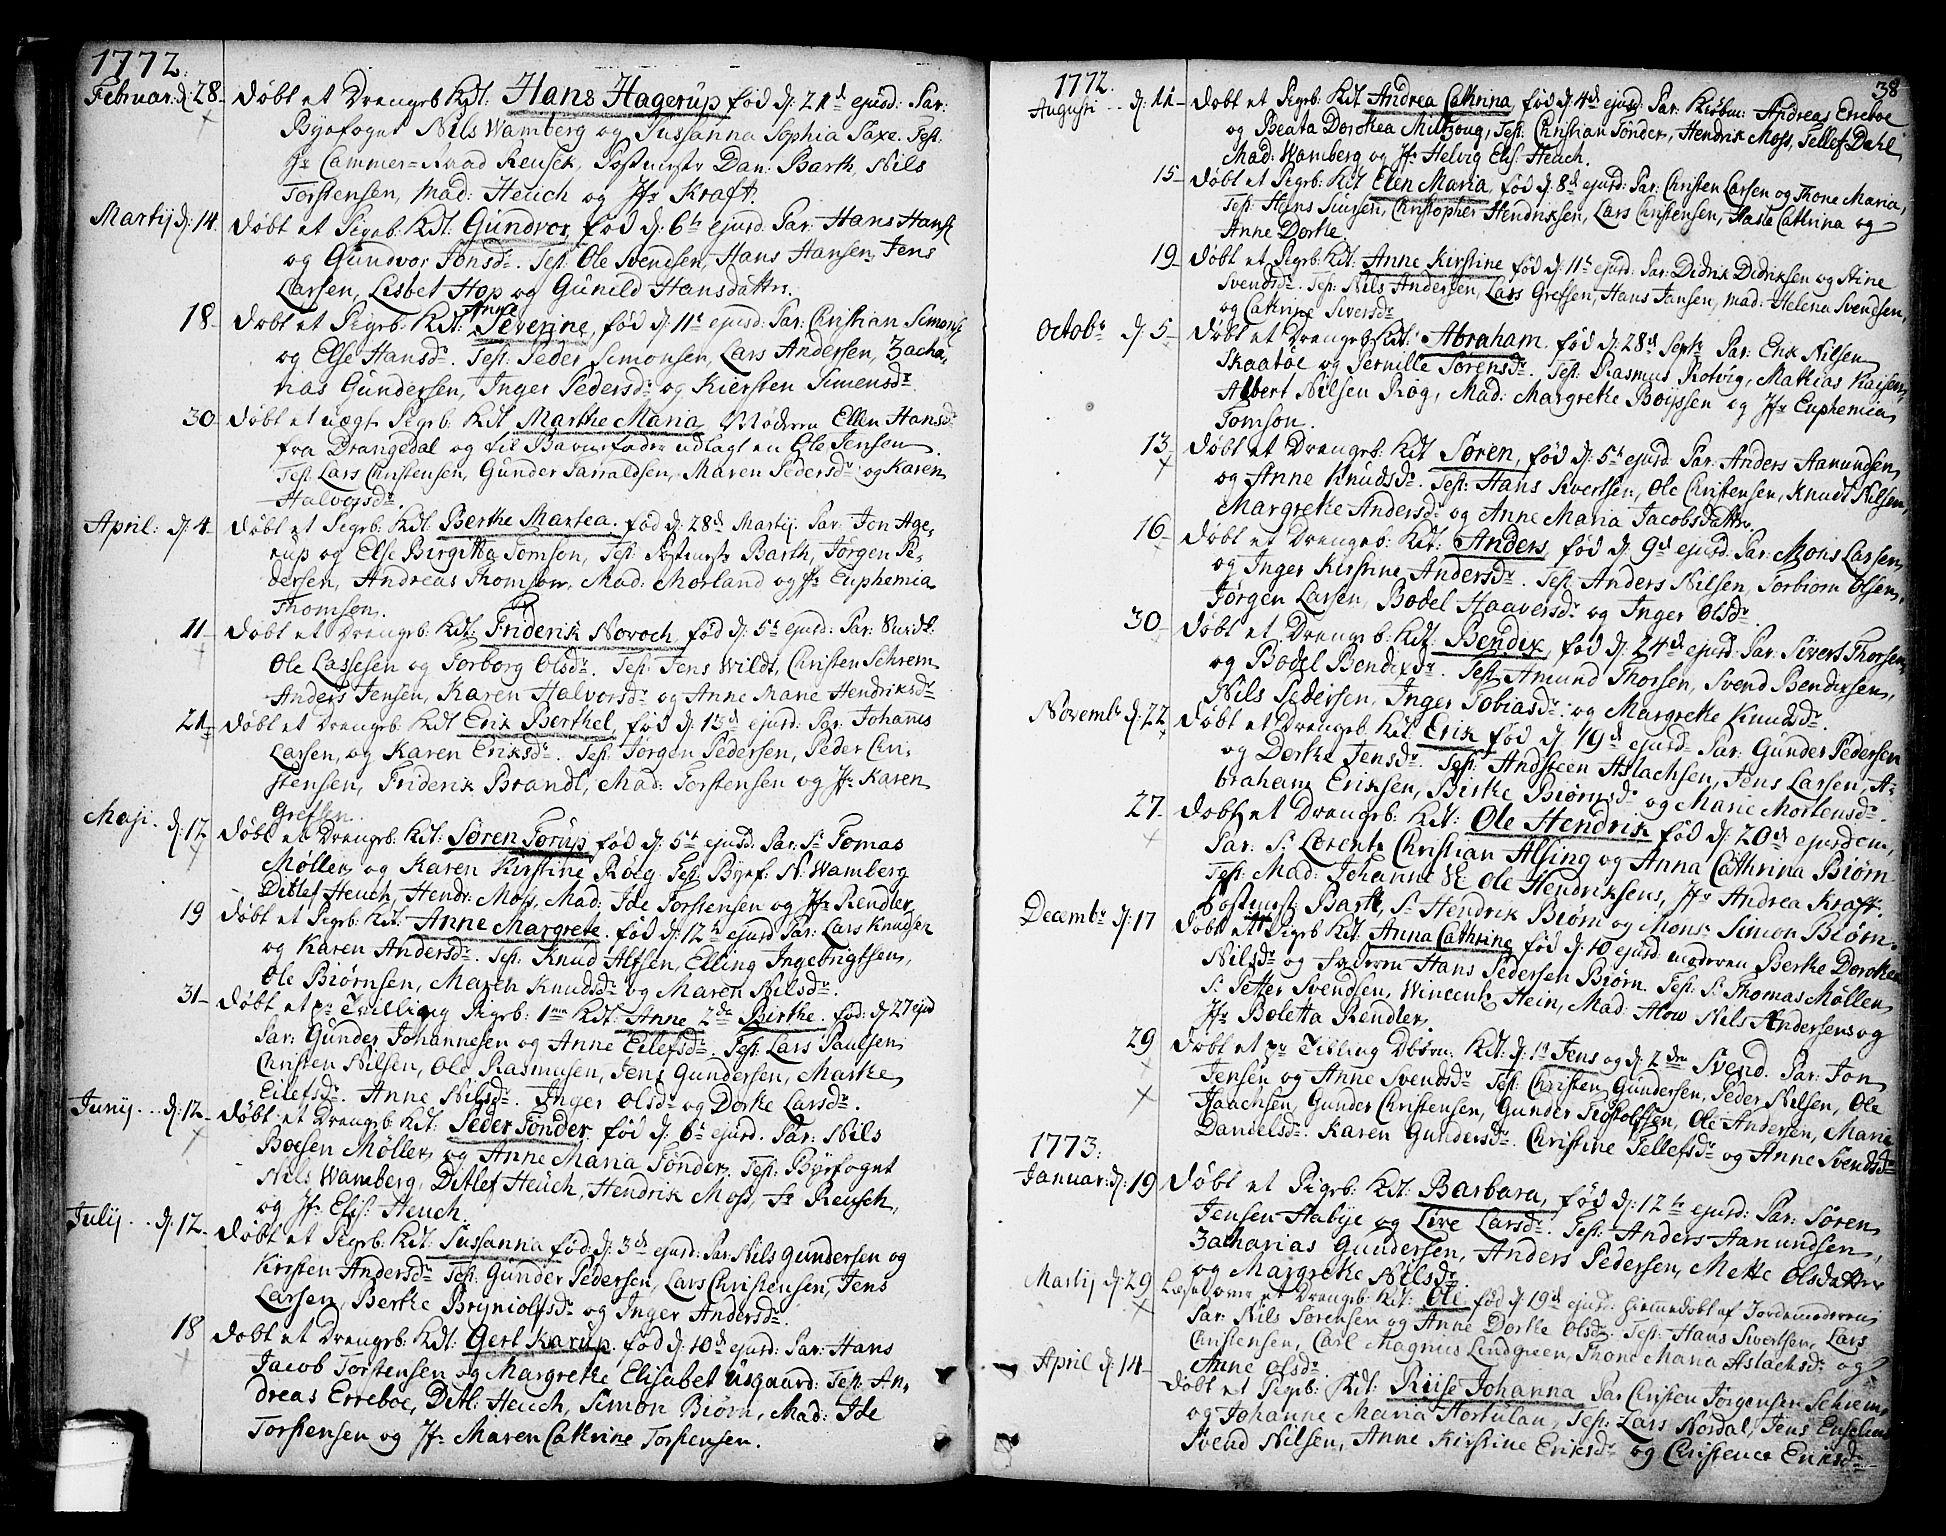 SAKO, Kragerø kirkebøker, F/Fa/L0002: Ministerialbok nr. 2, 1767-1802, s. 38